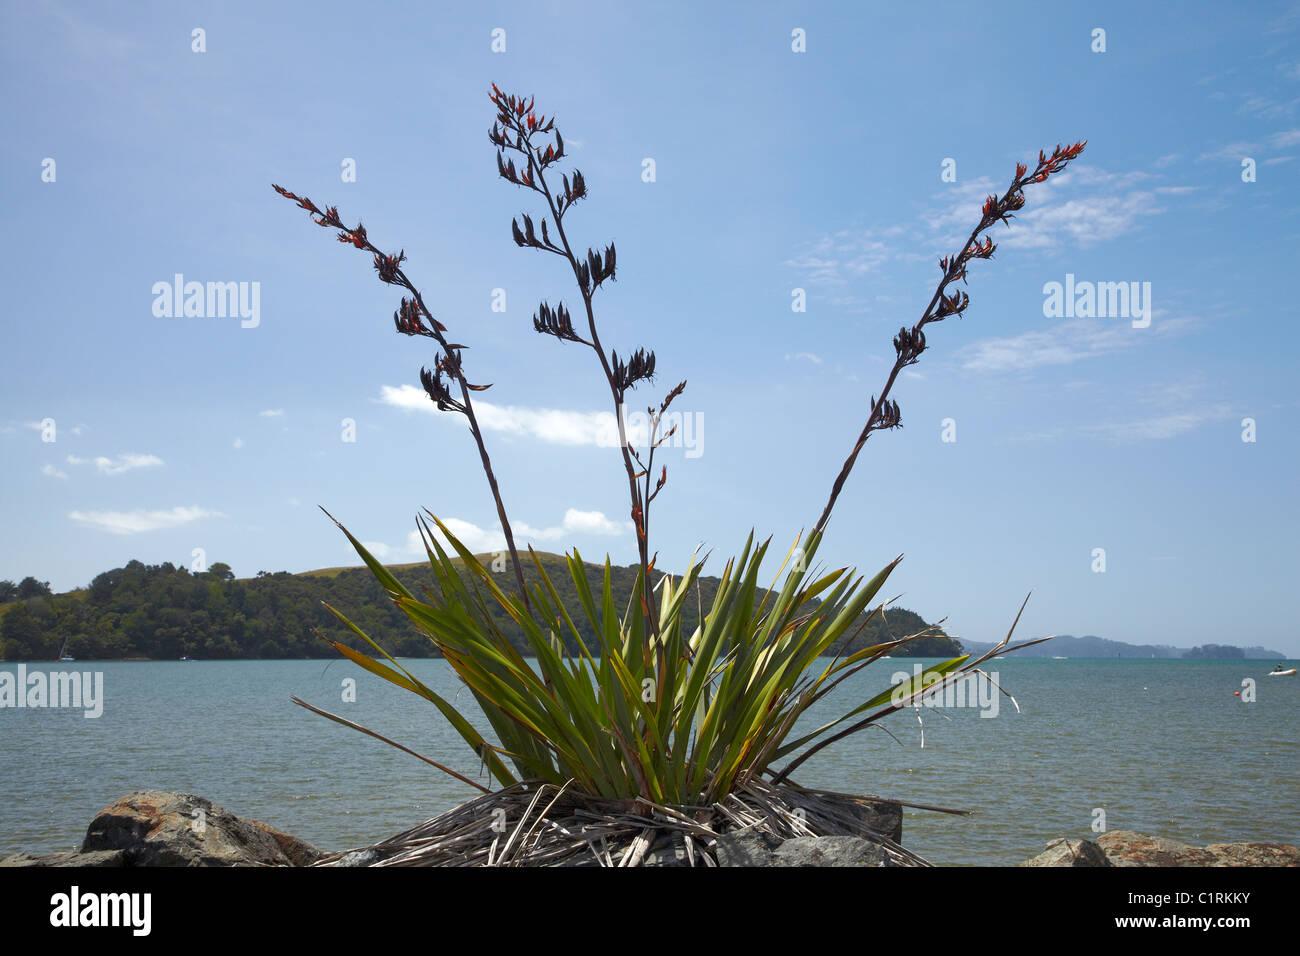 Flax Bush (Phormium tenax), Sandspit, near Warkworth, Auckland Region, North Island, New Zealand - Stock Image